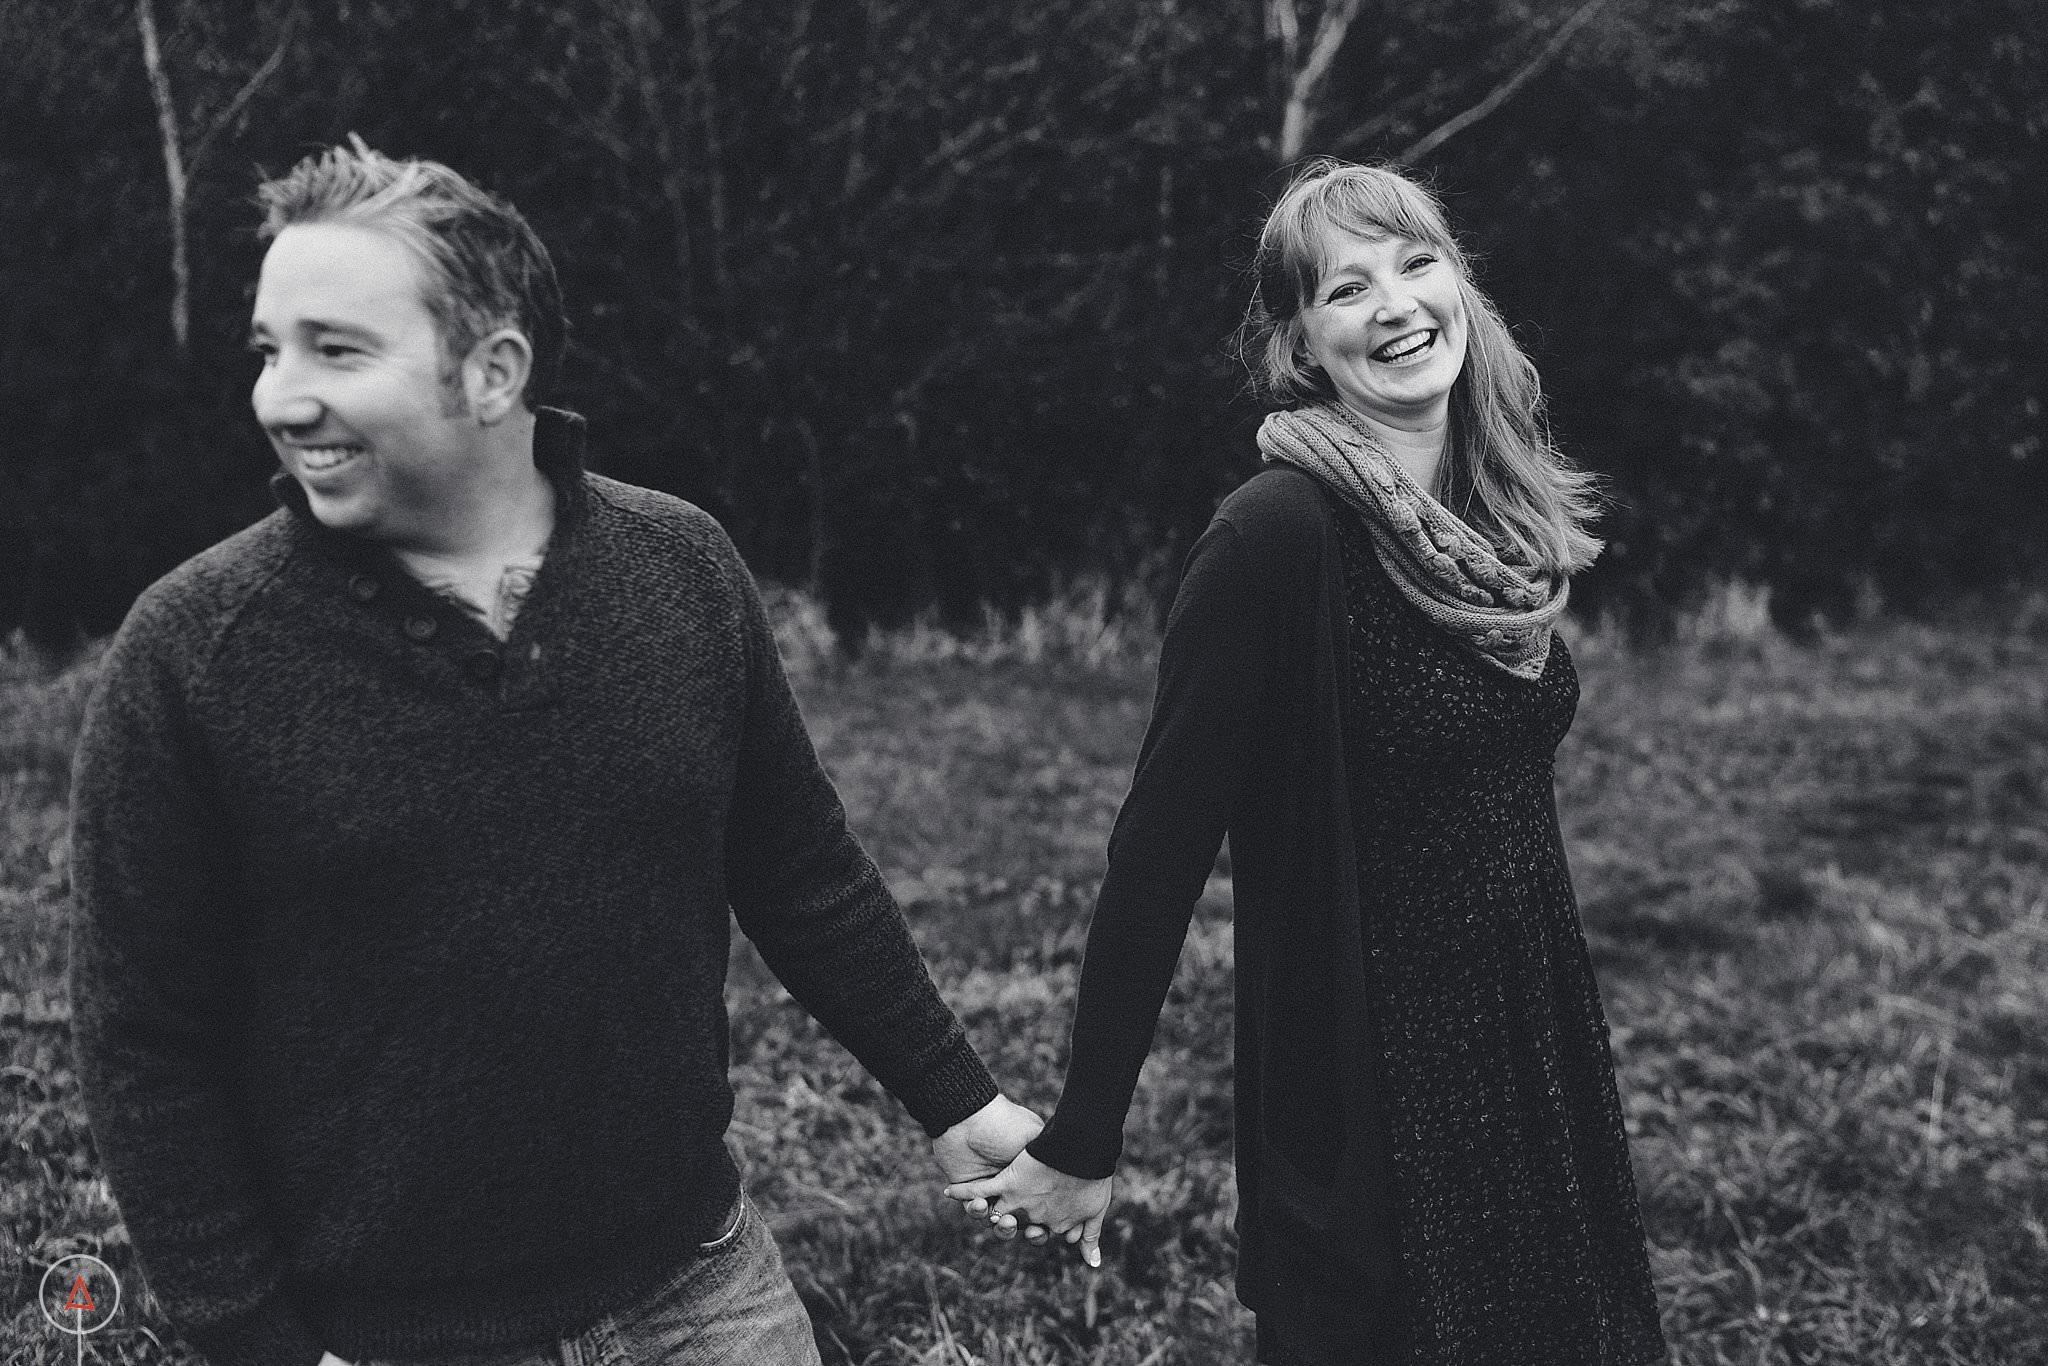 South-Wales-Pre-Wedding-Photography-Aga-Tomaszek-00013